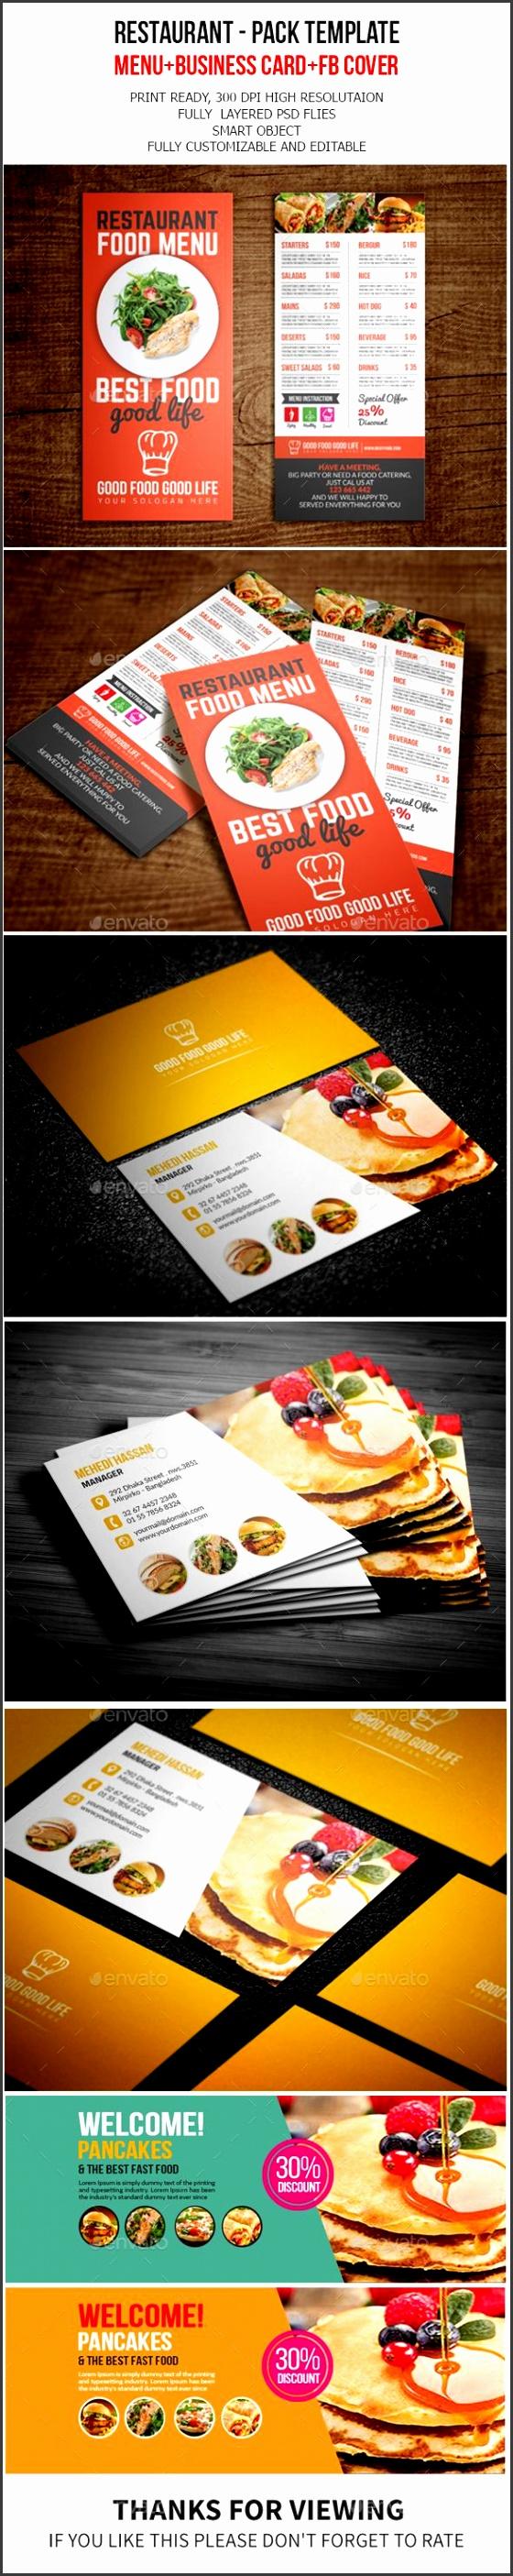 Restaurant Pack Template